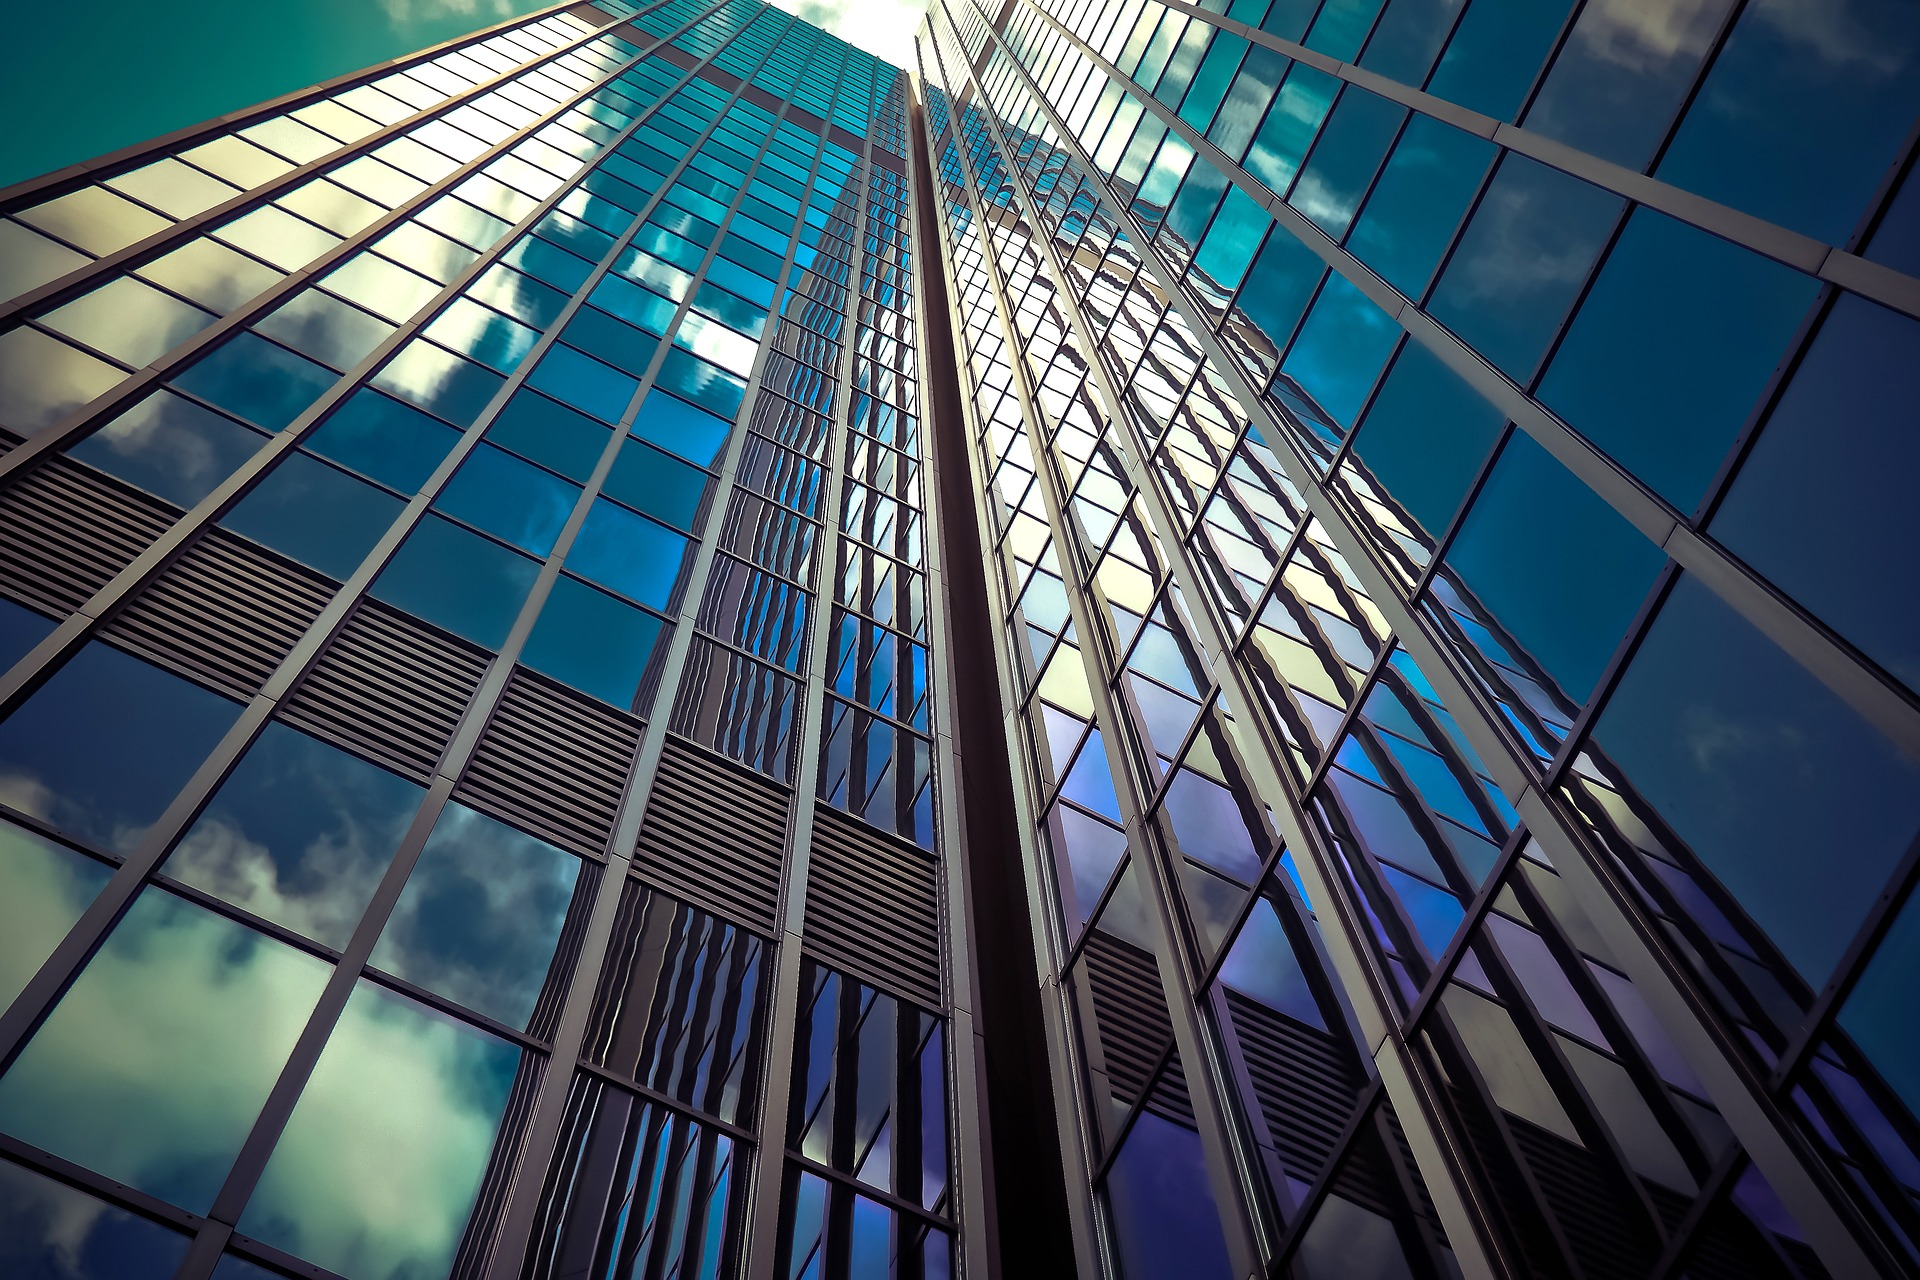 An up-close image of a skyscraper